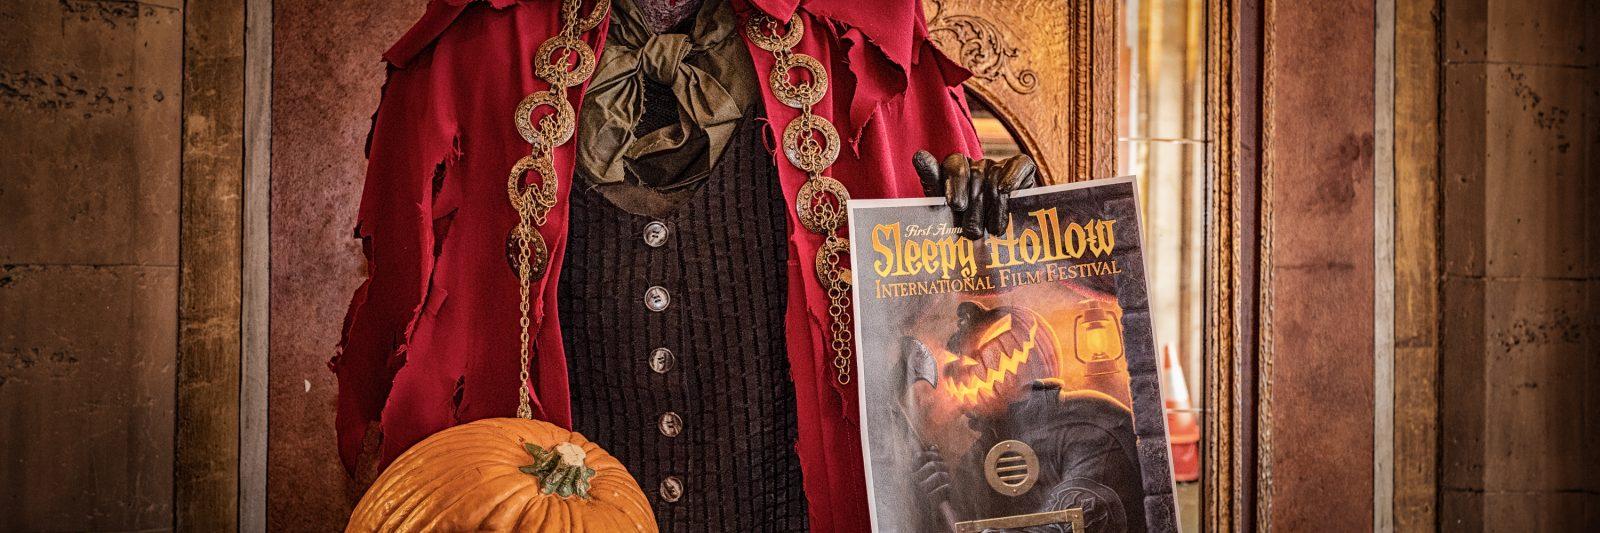 The headless horseman holds a poster for Sleepy Hollow International Film Festival.